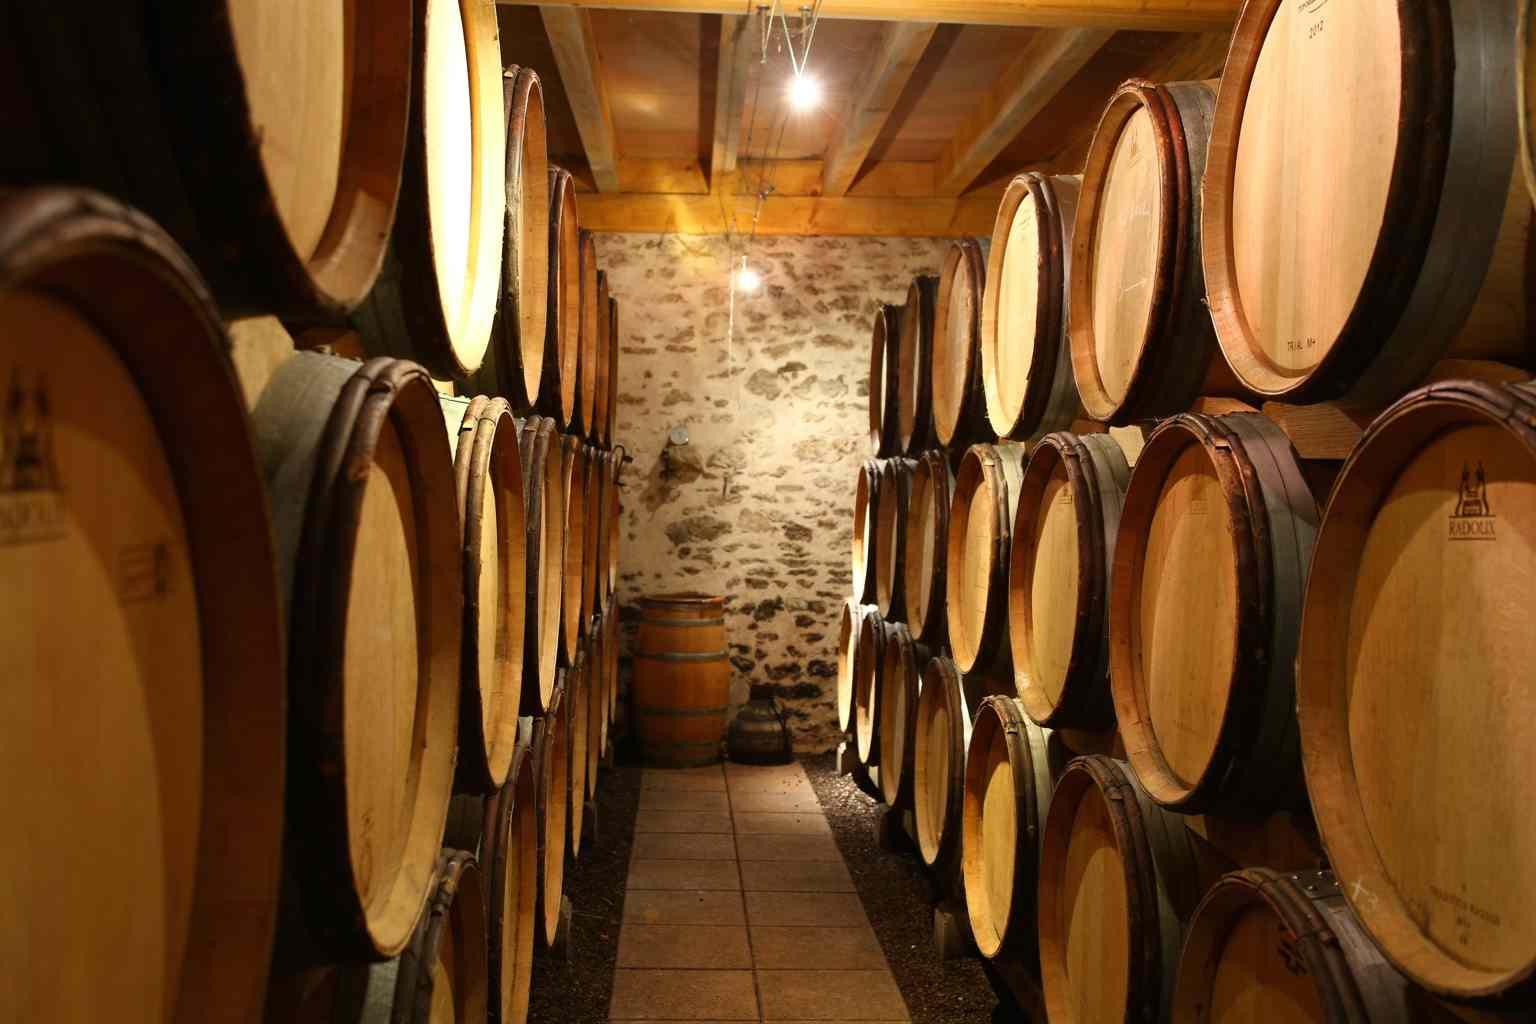 Domaine Robert Denogent - アペロ ワインバー / apéro WINEBAR - vins et petits plats français - Minami Aoyama Tokyo